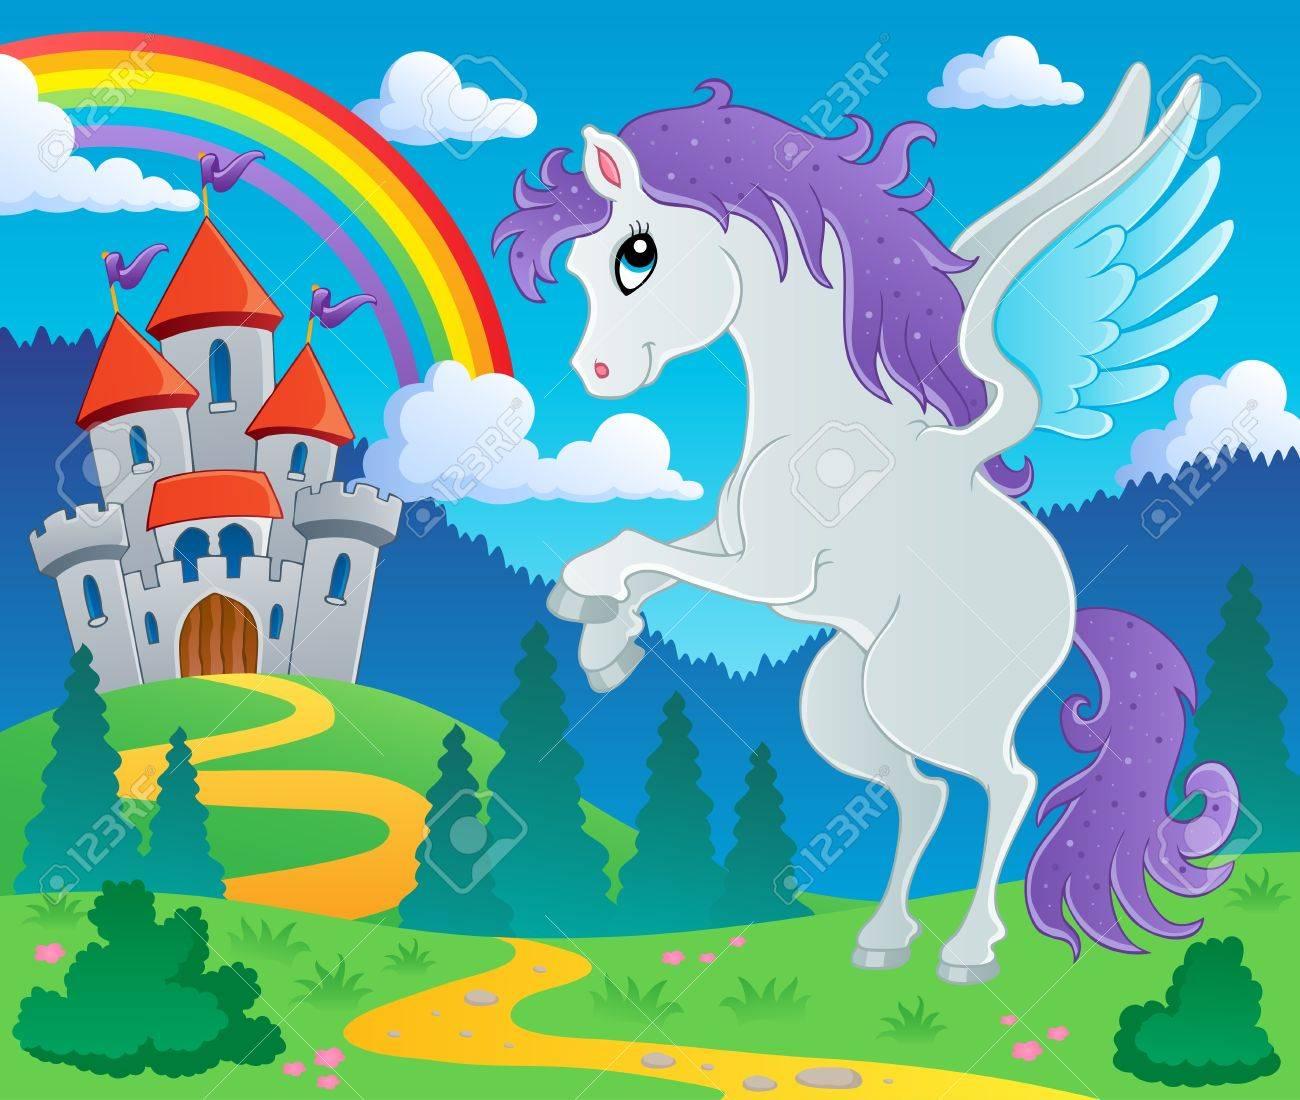 Fairy tale pegasus theme image 2 - vector illustration Stock Vector - 15045988